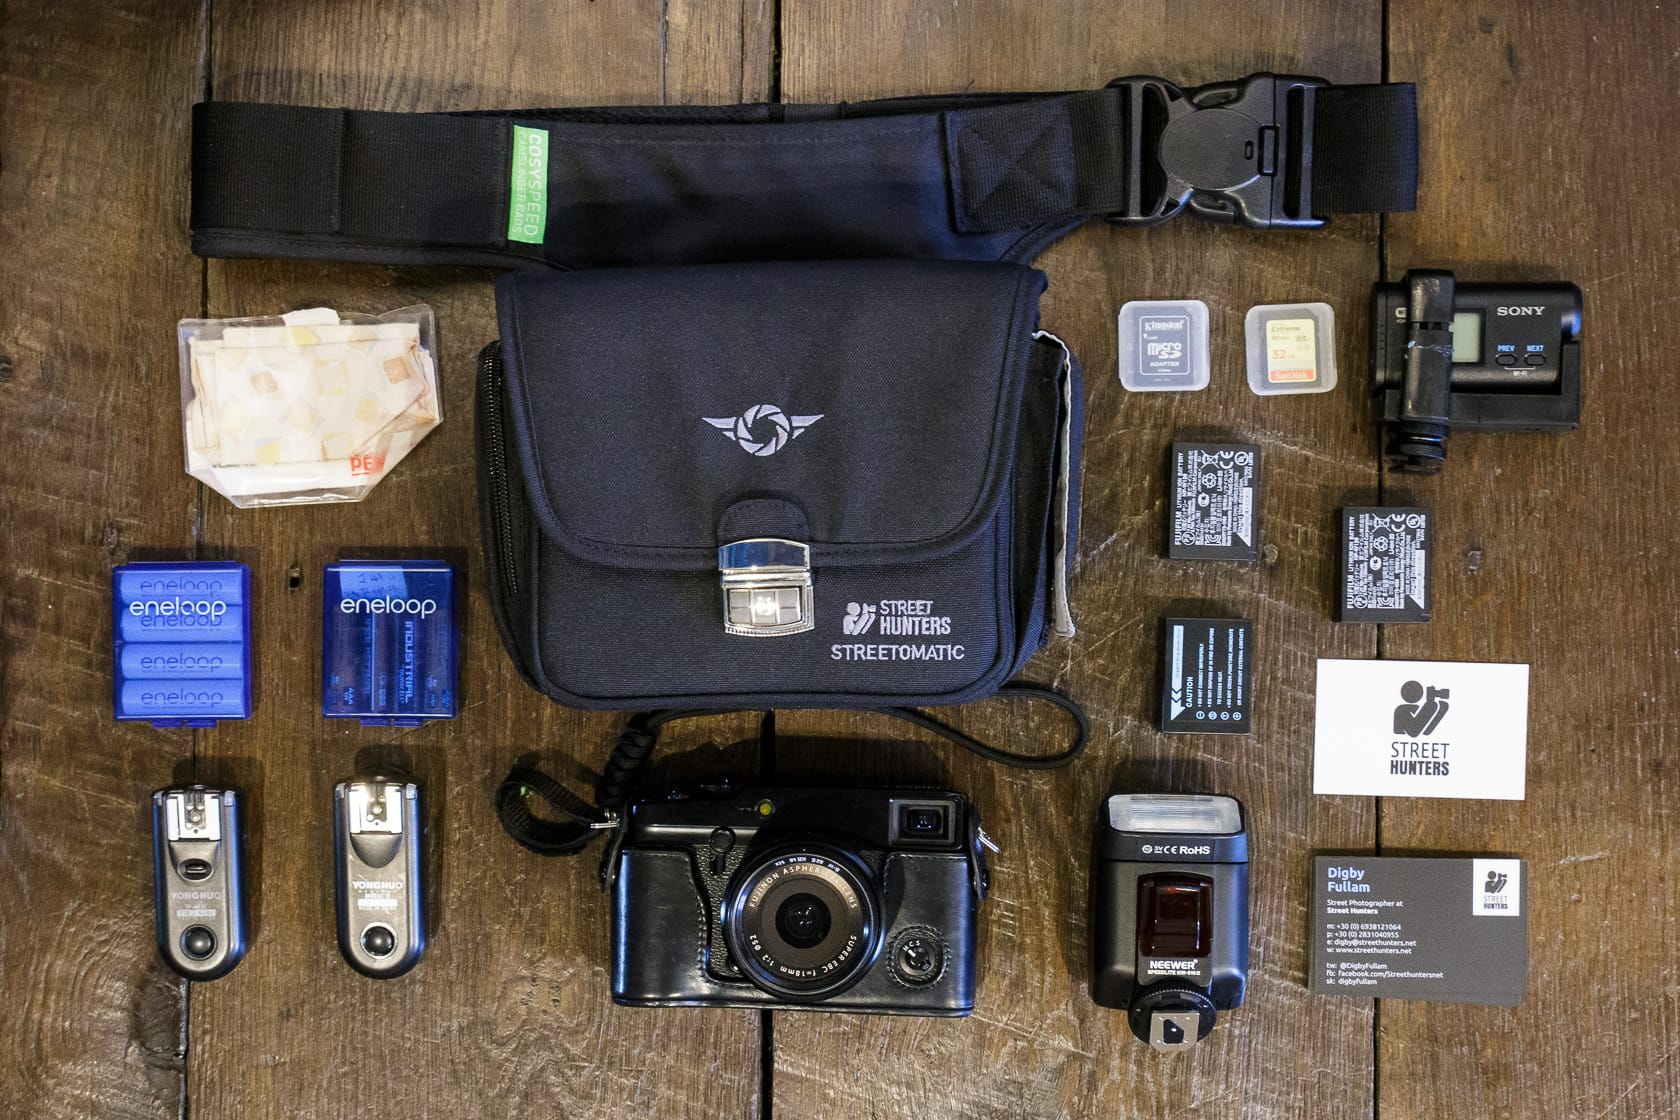 Digby Fullam Streethunters Streetomatic camera bag